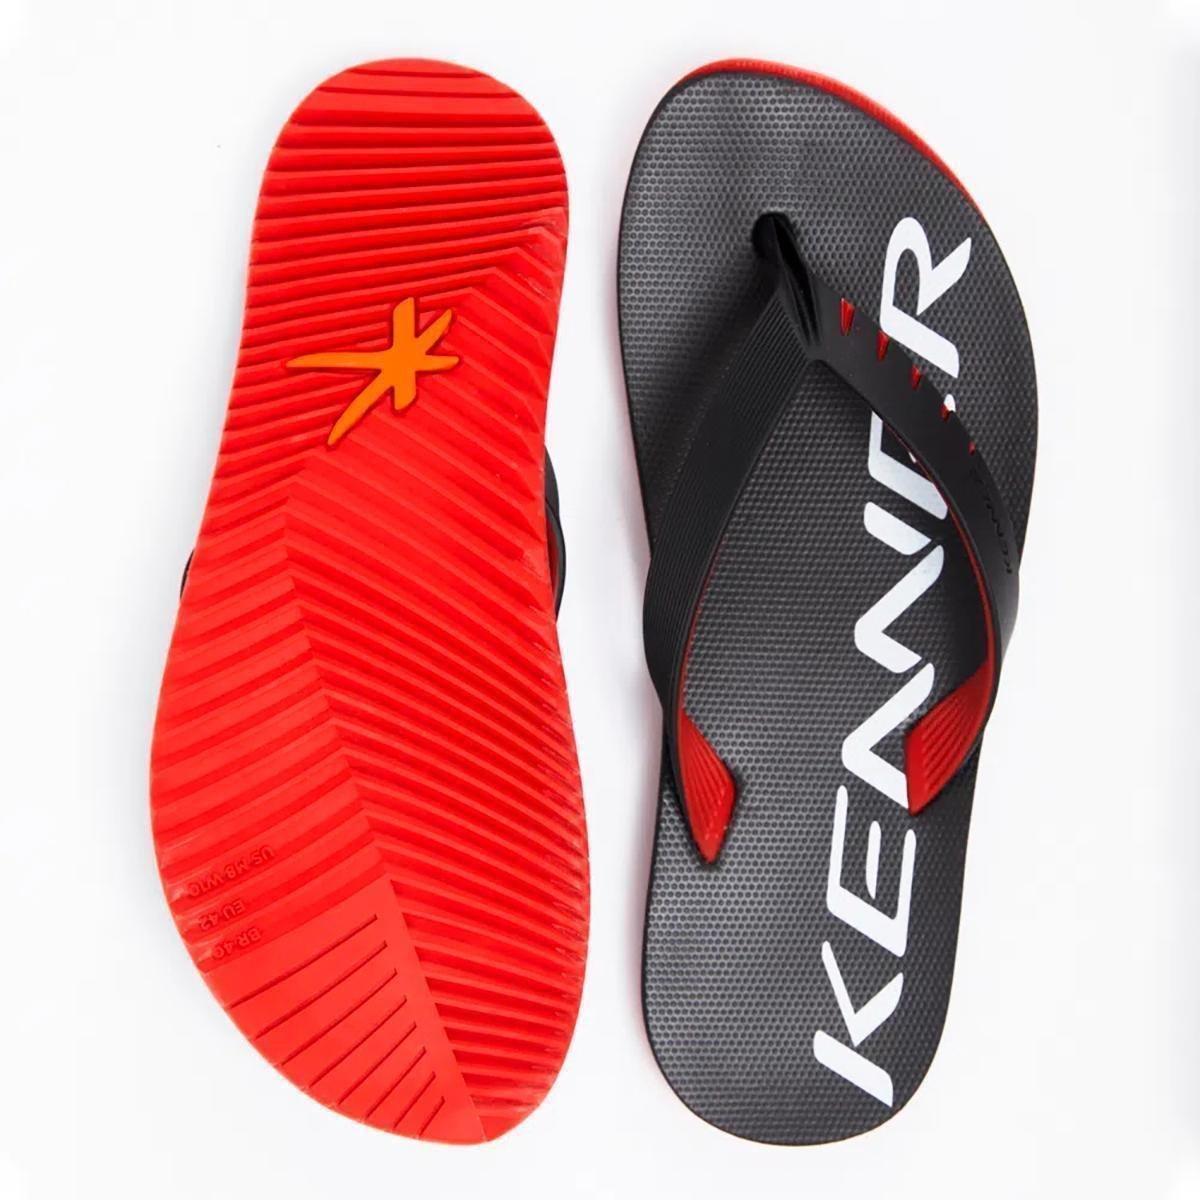 Chinelo Kenner Red High HOK Masculino - Preto e Vermelho